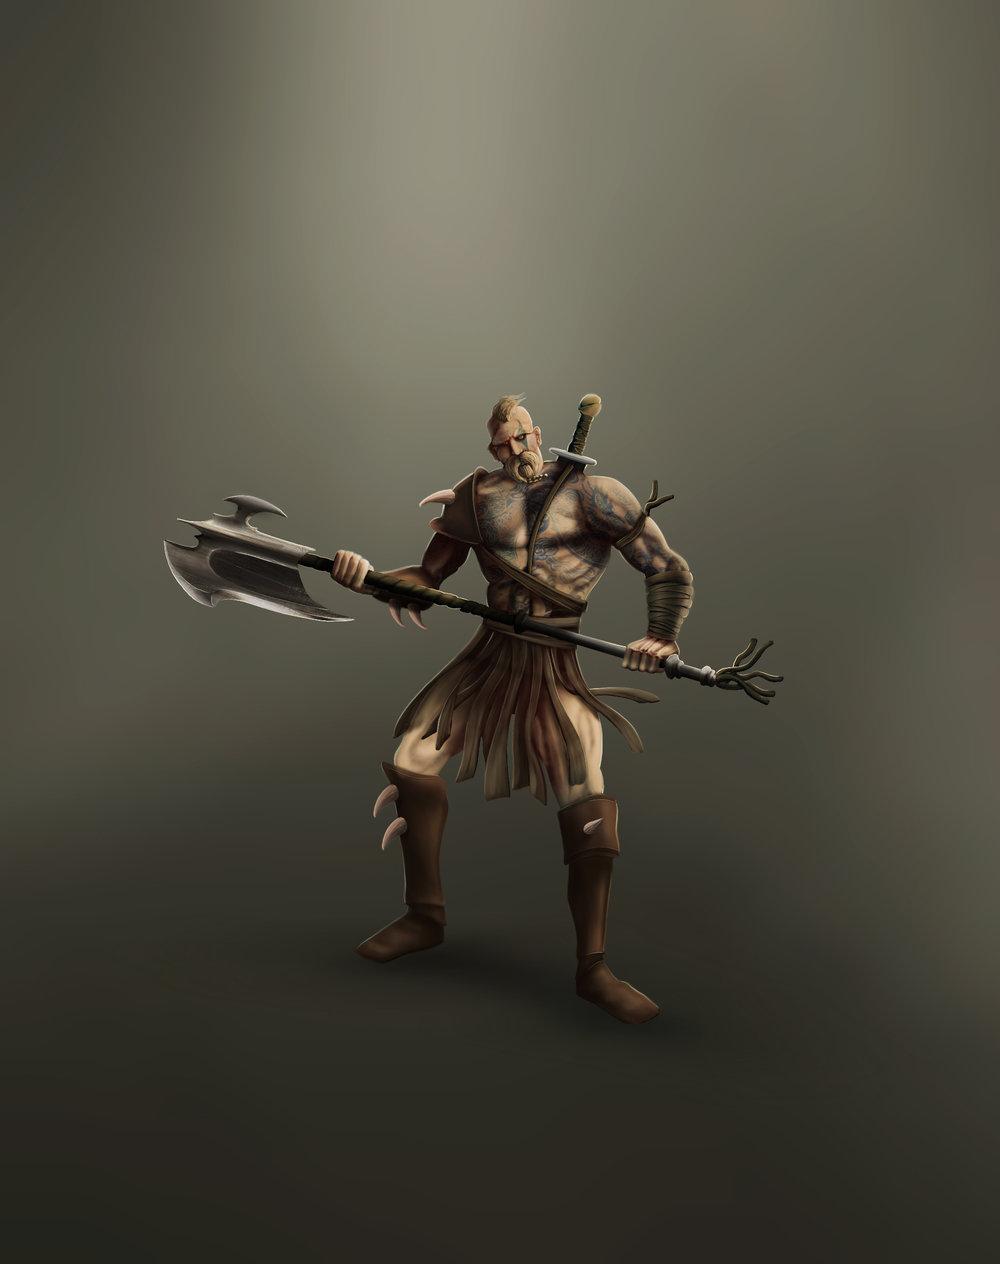 Viking_warrior.jpg